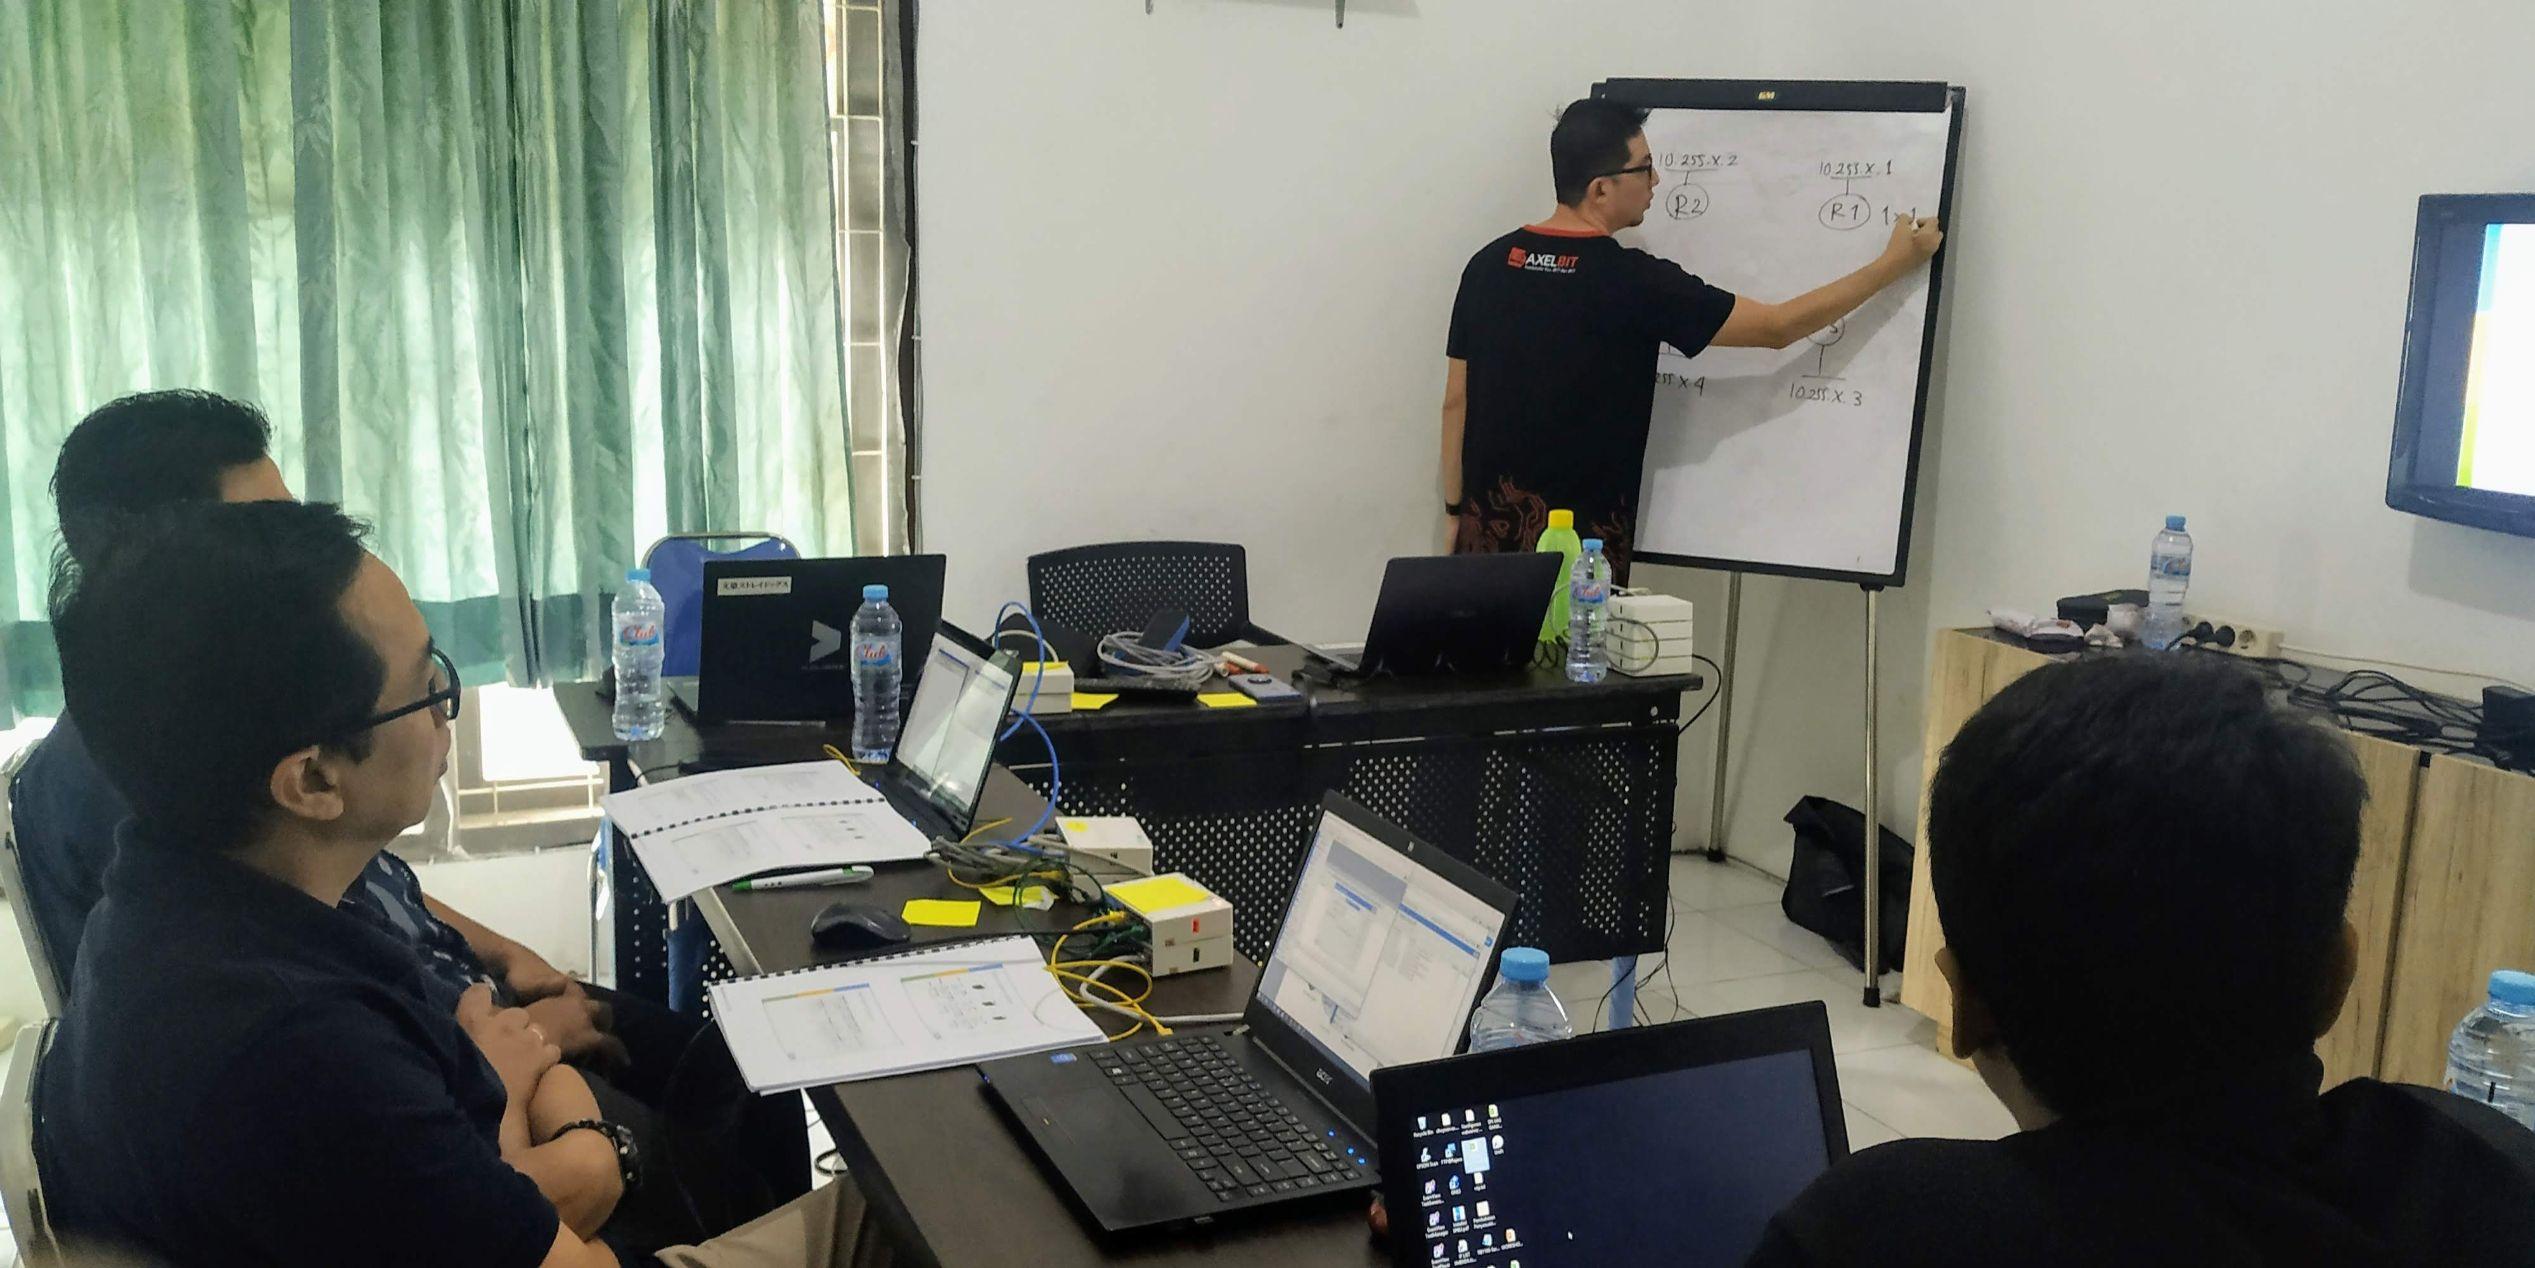 belajar, mikrotik, sertifikasi, training, IMG_20190705_093435~2